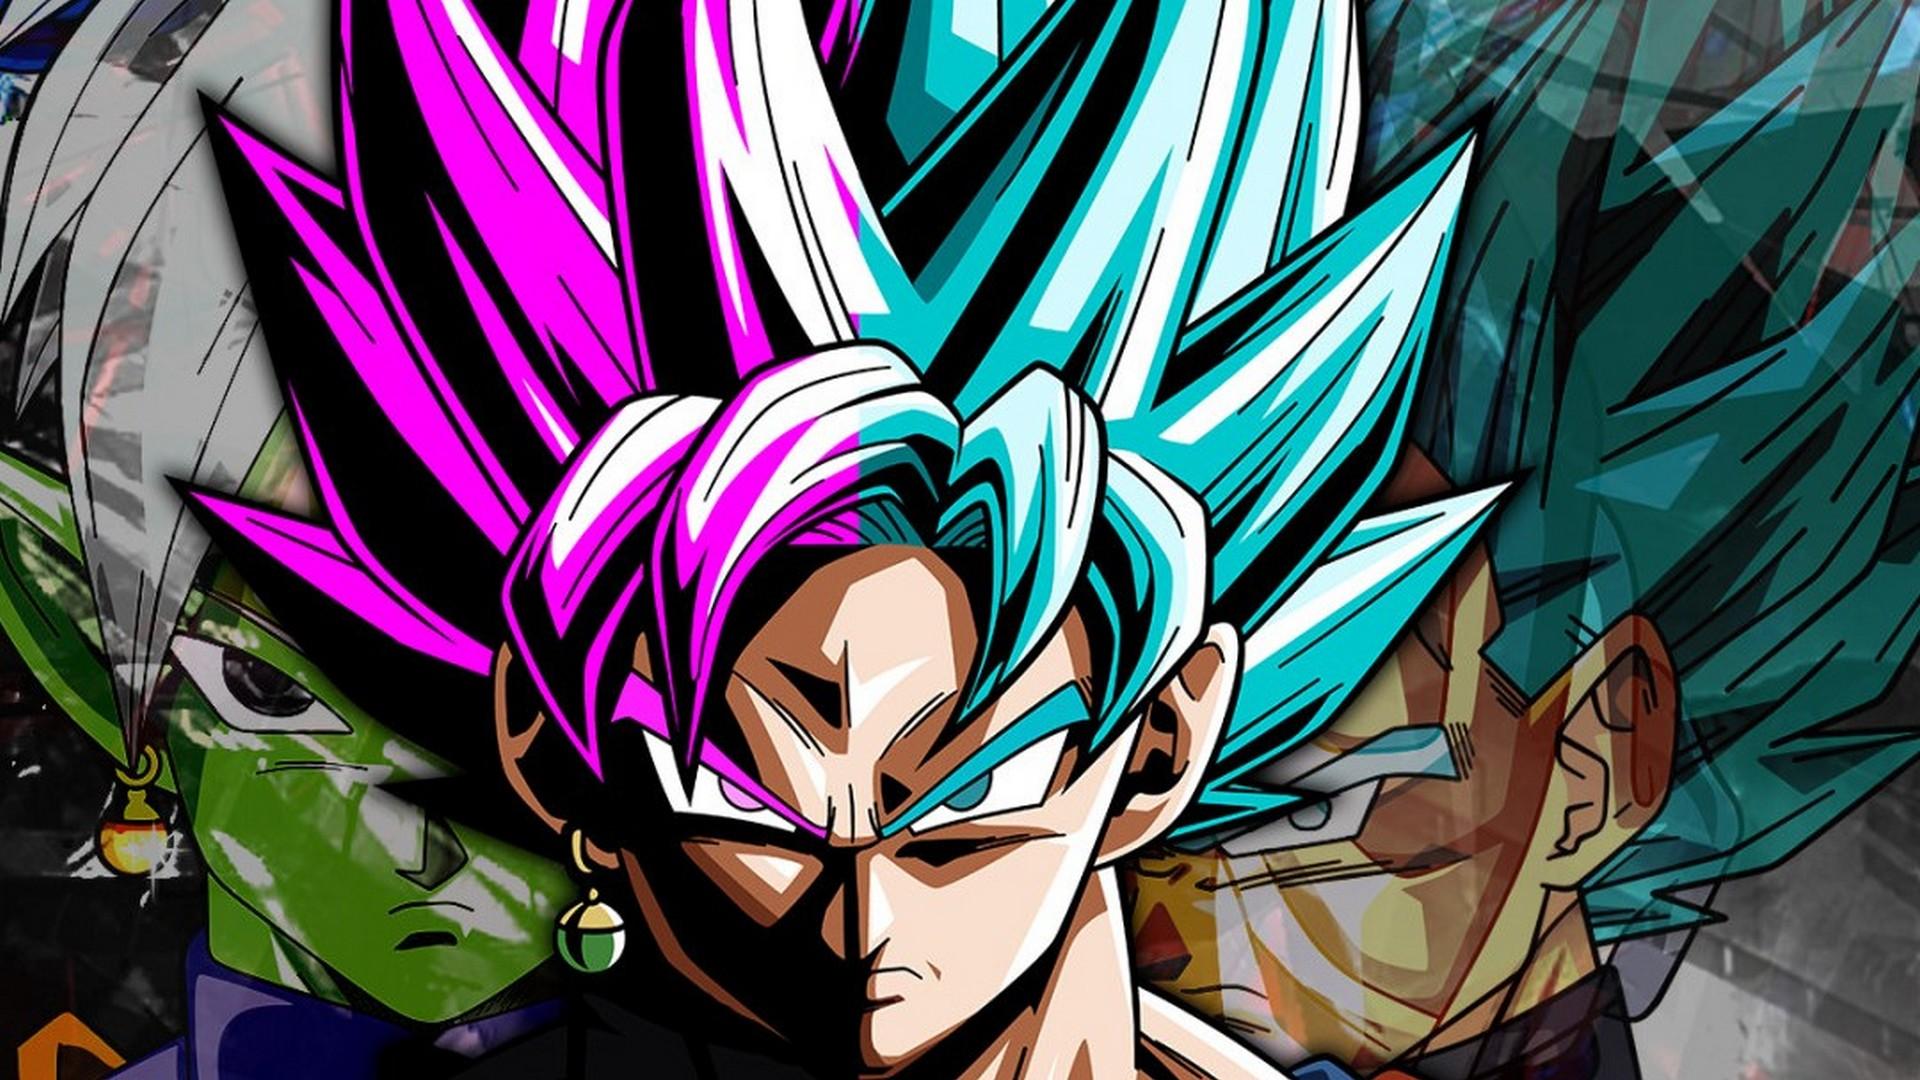 Black Goku Desktop Wallpaper With Image Resolution Goku Black Wallpaper Hd 1920x1080 Download Hd Wallpaper Wallpapertip